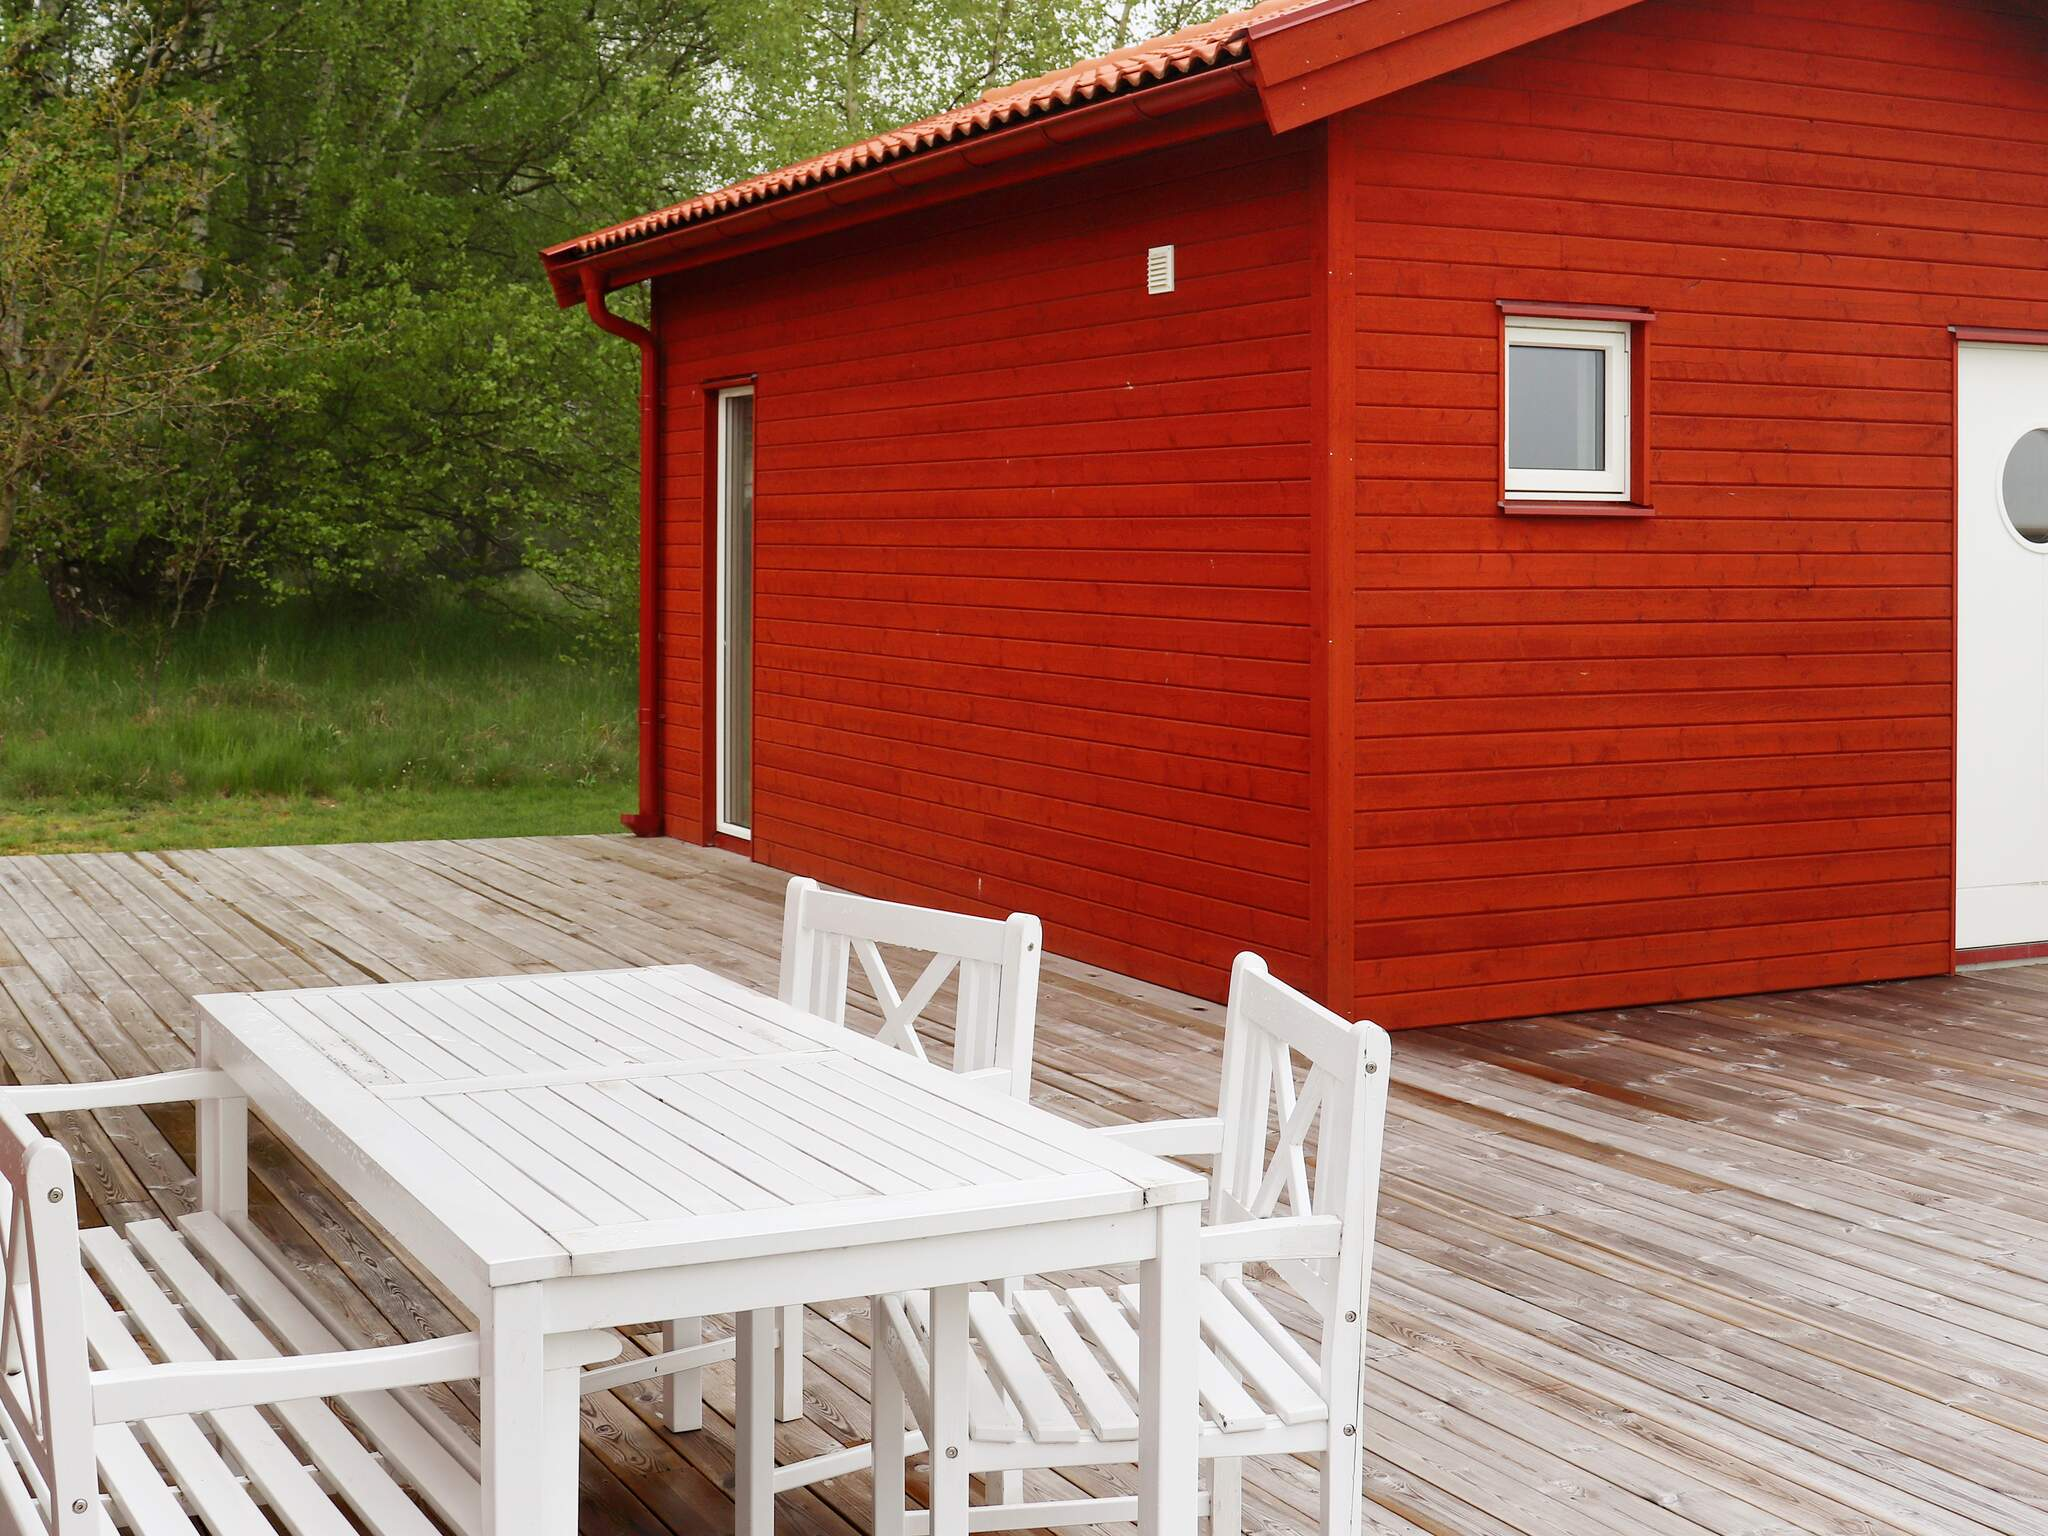 Ferienhaus Degeberga (2624324), Degeberga, Skane län, Südschweden, Schweden, Bild 14